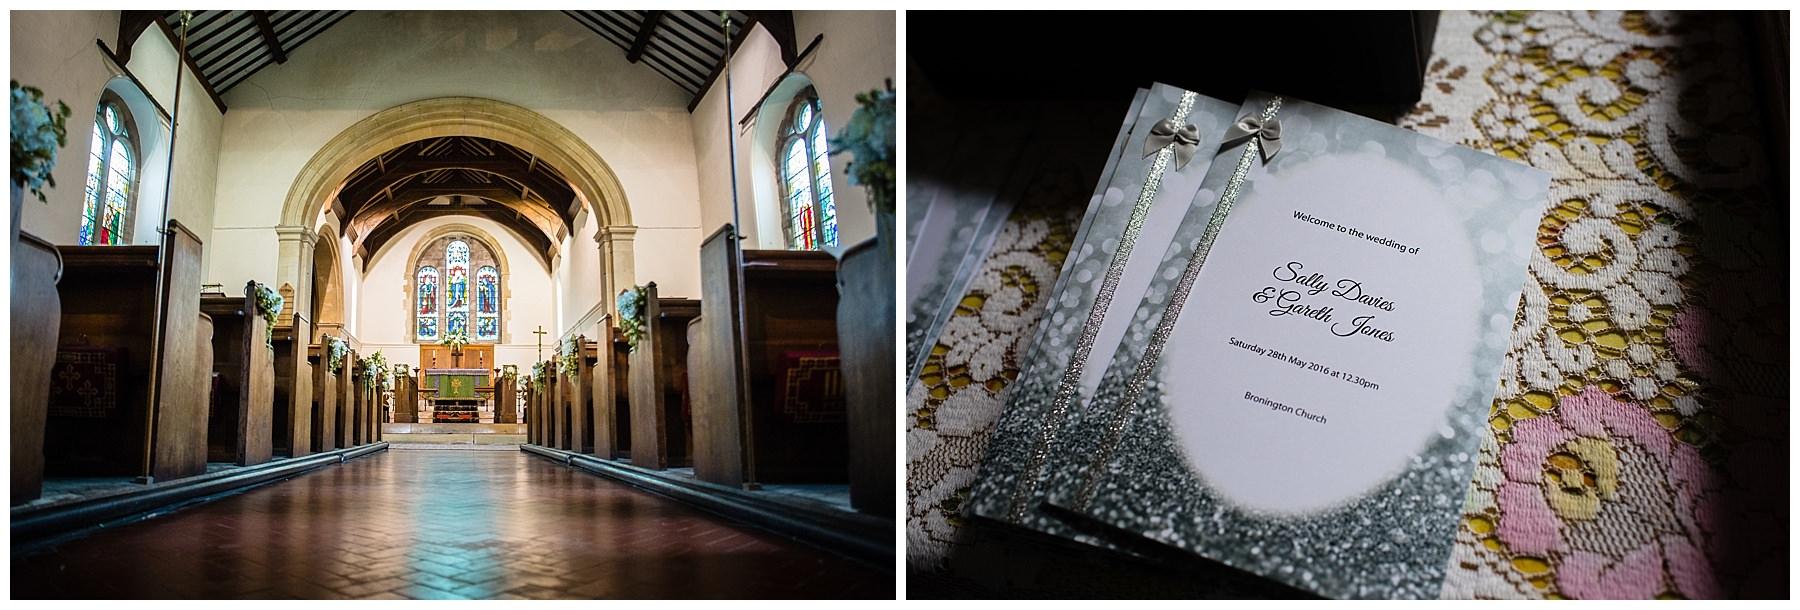 St Marys and St Michaels Church, Burleydam, Whitchurch Shropshire ready for a wedding, Shropshire Wedding Photographer